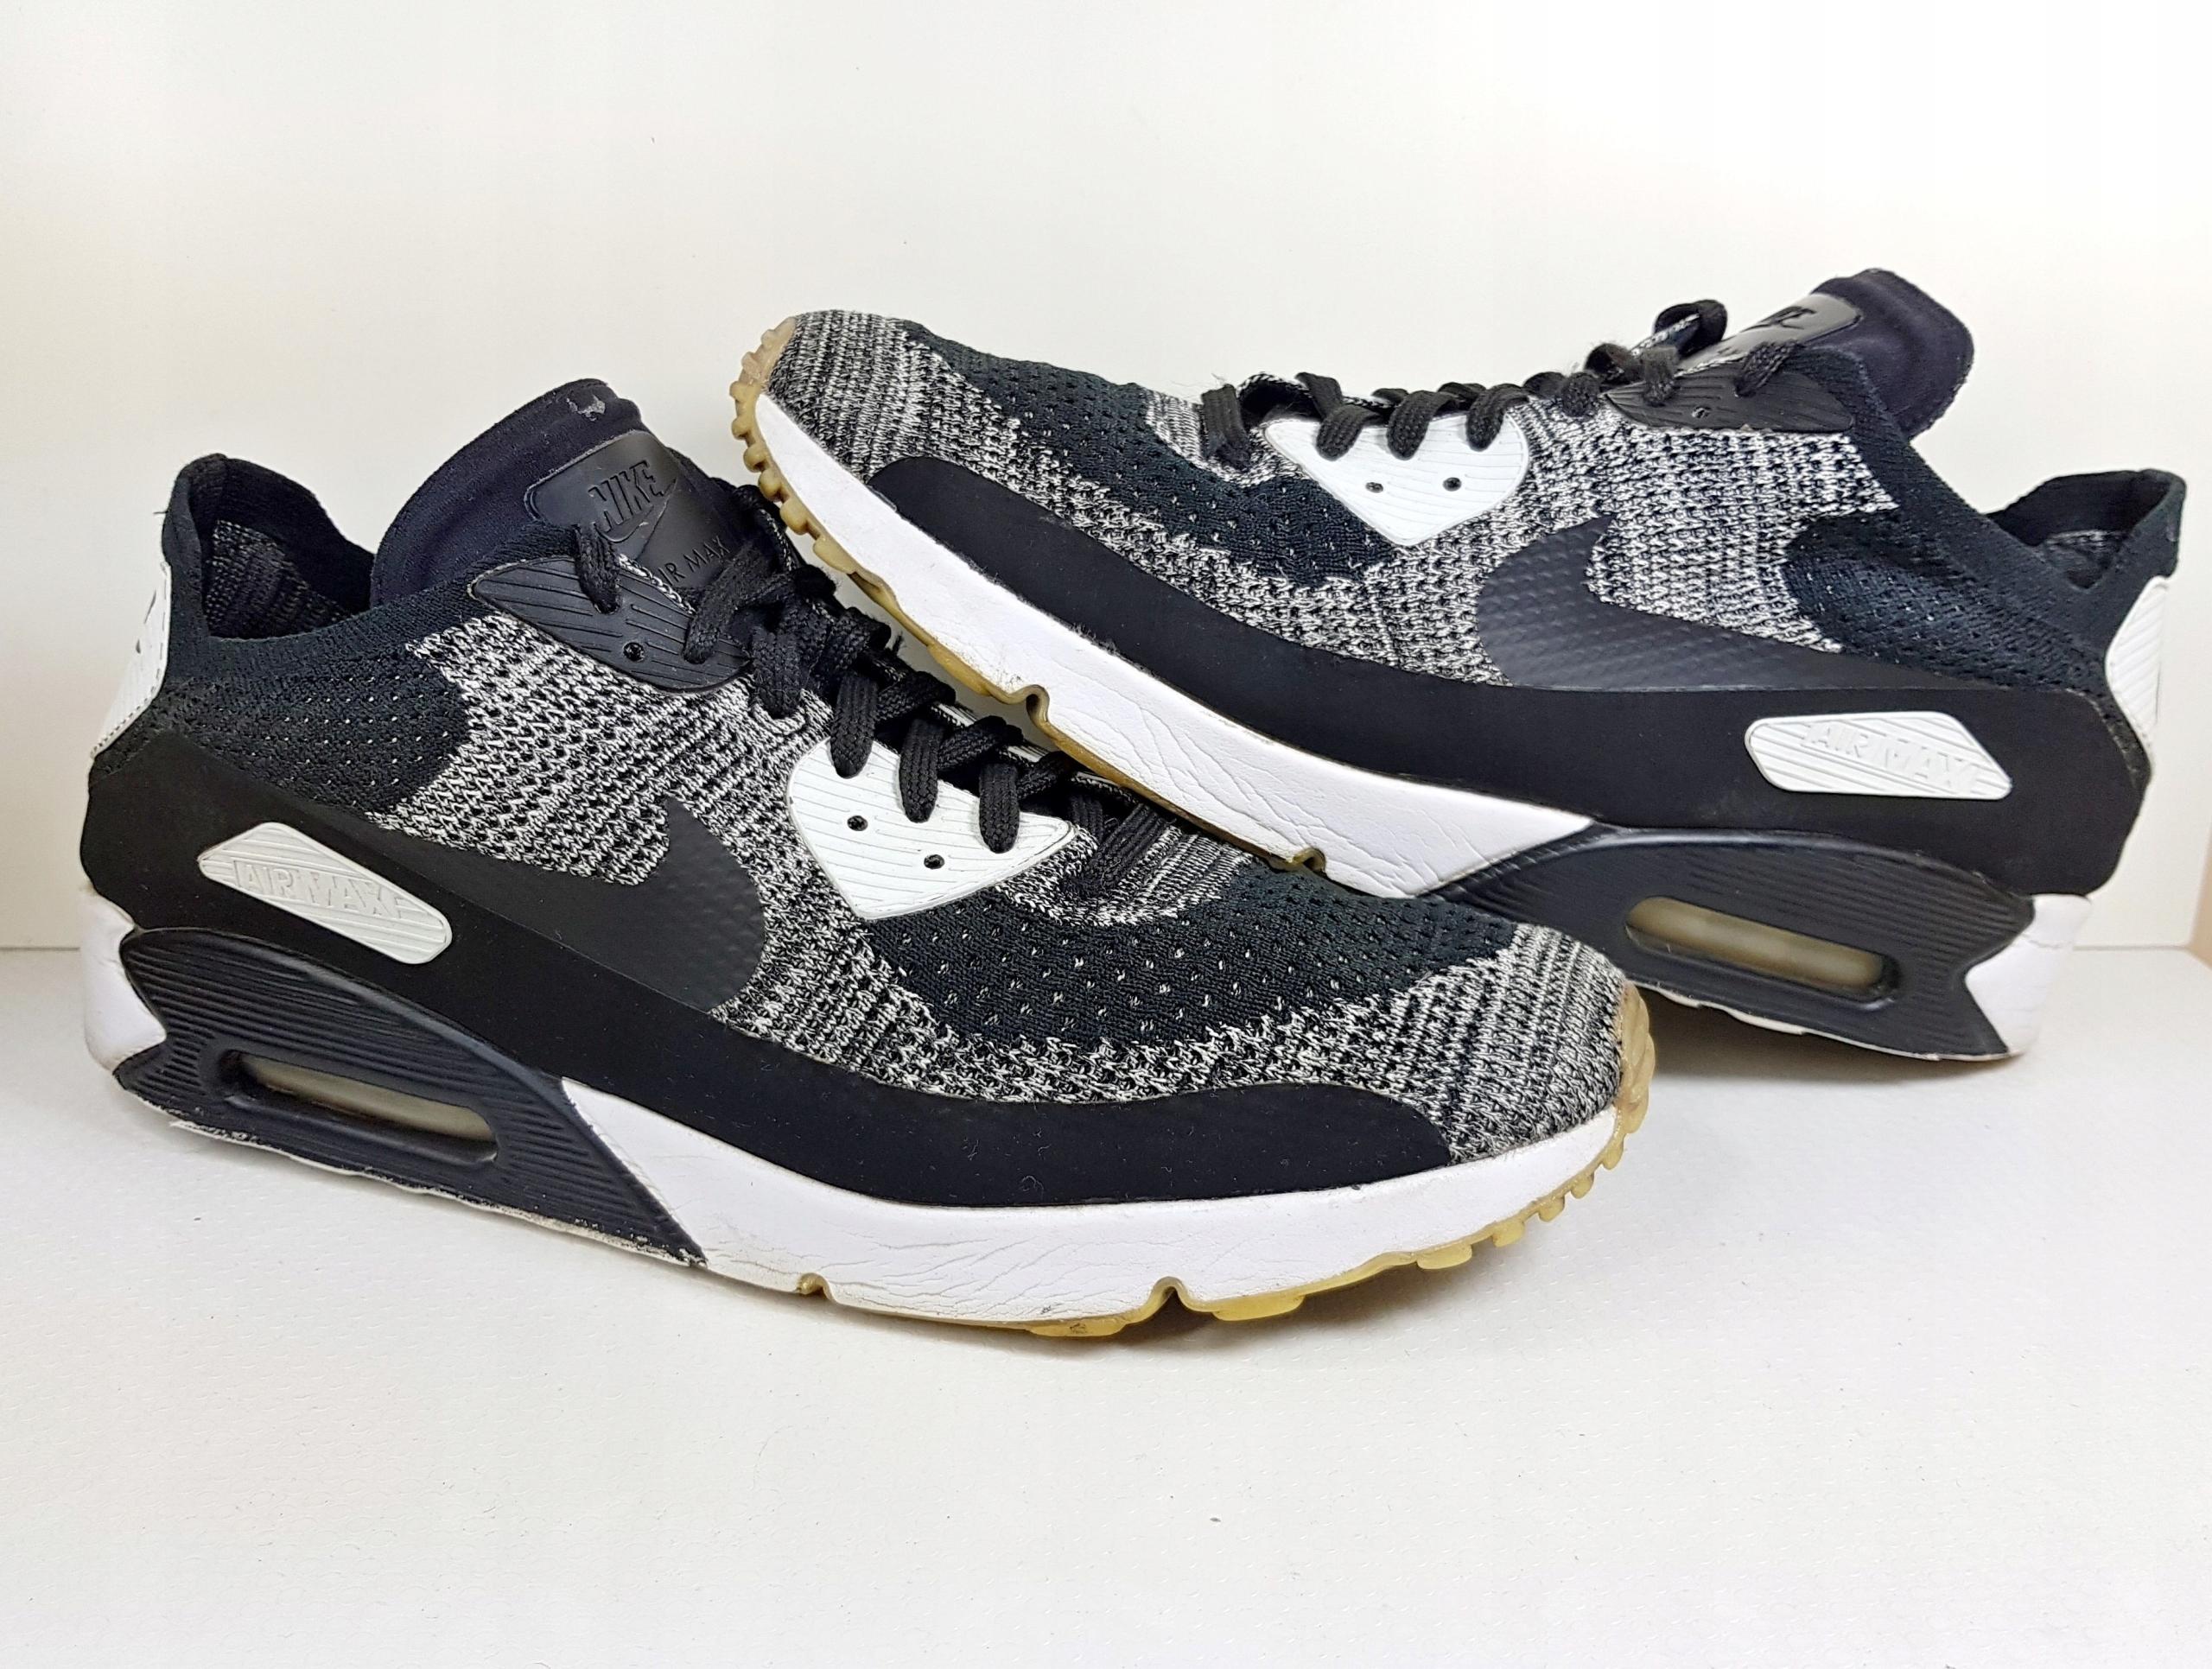 Buty Nike Air Max 90 Flyknit r.41